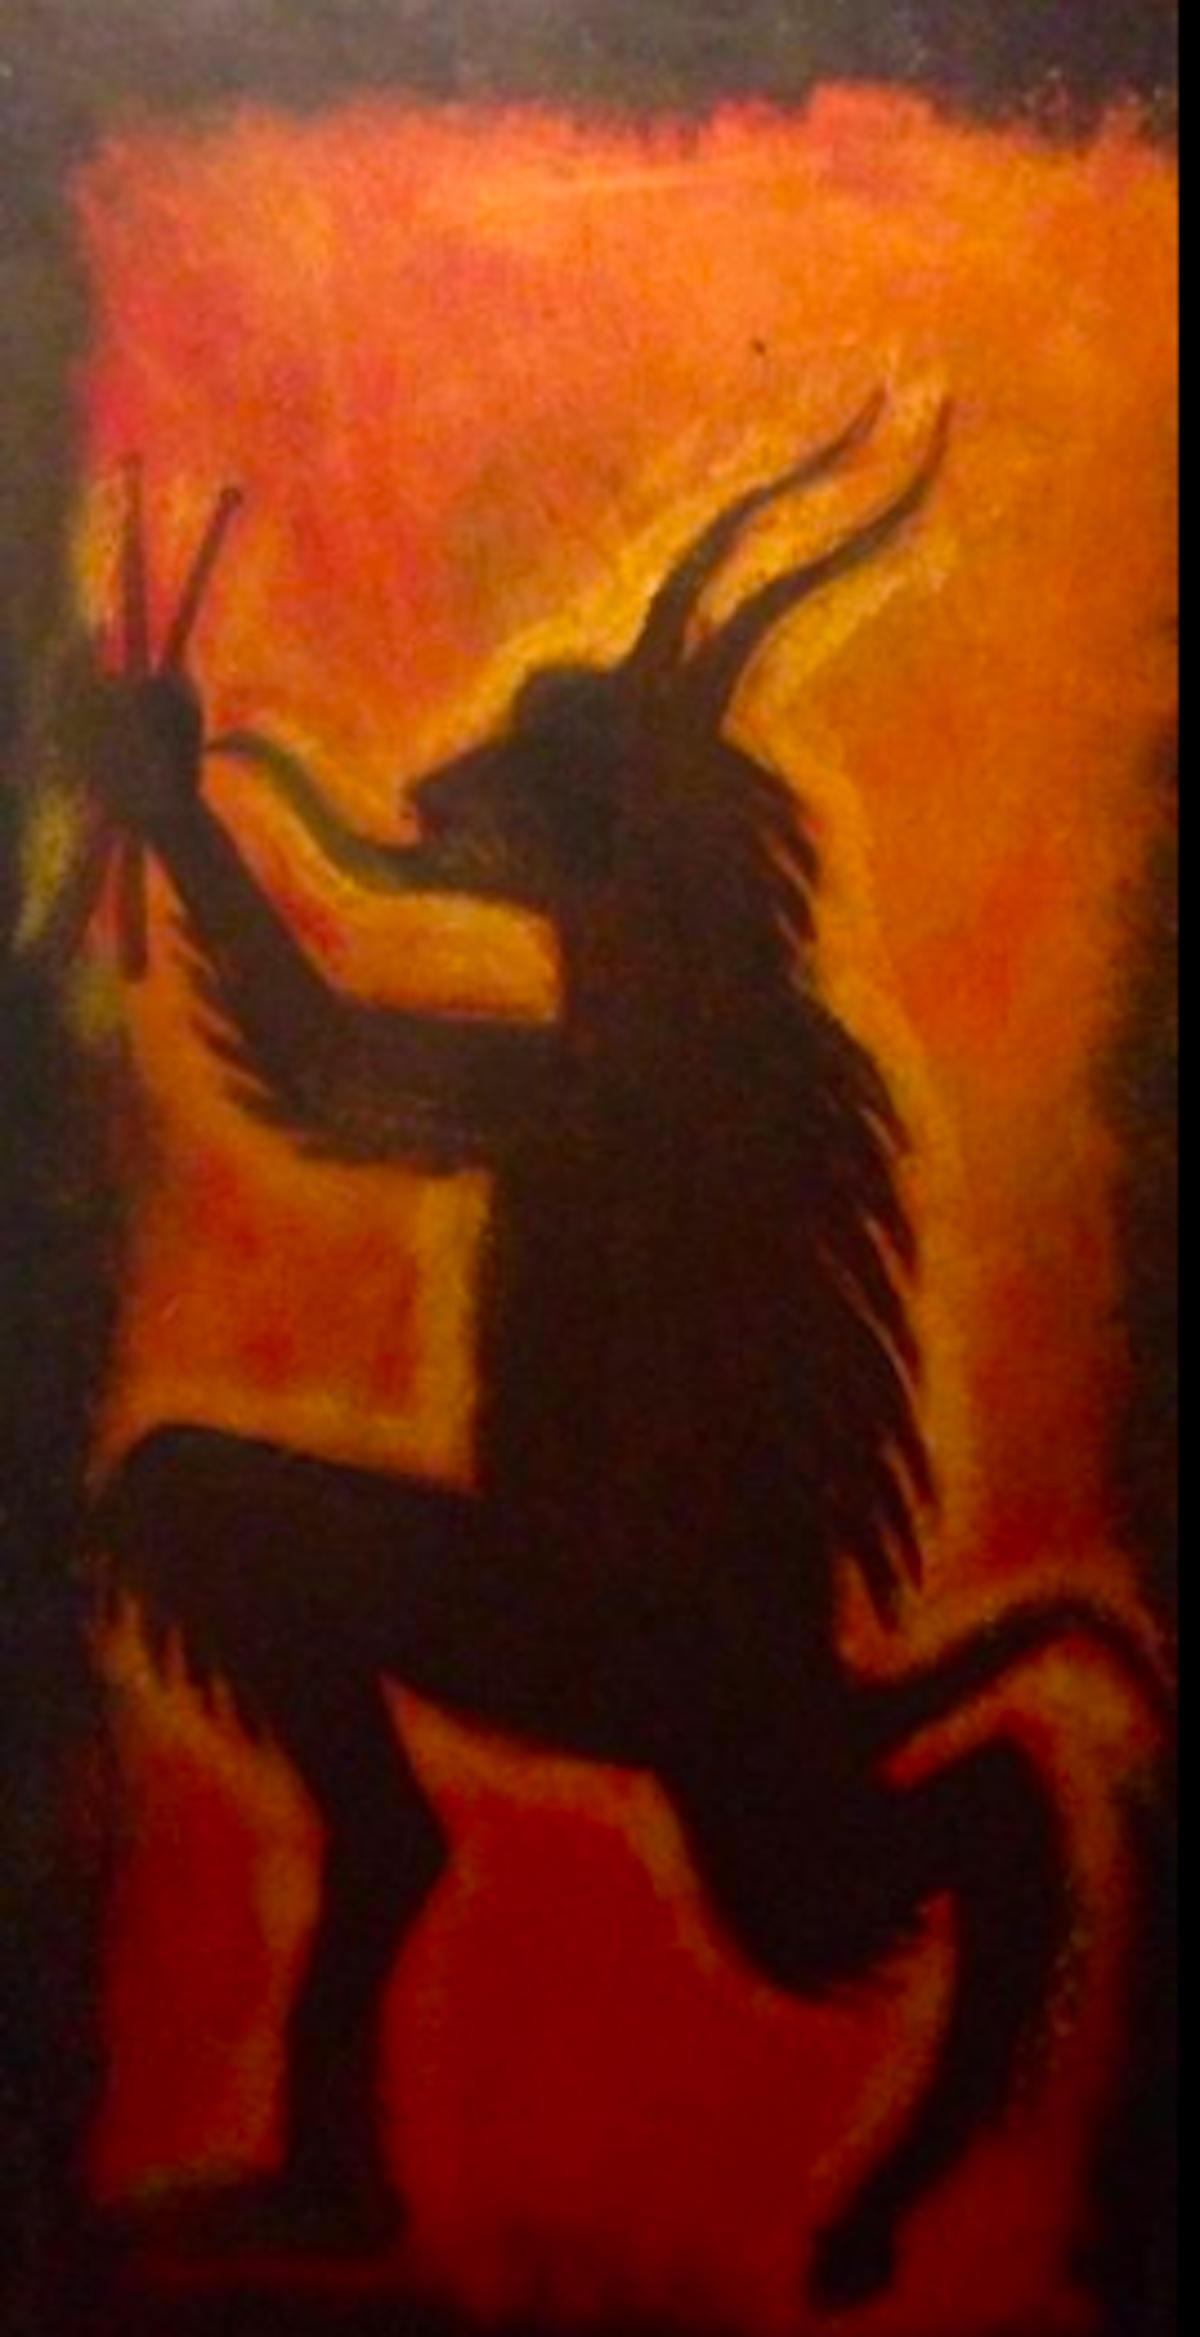 Aisla Islava eLoterrhea! El Diablito MusiCante Ill.Omenado (2018) Acrylic on Wood Panel, 4'x6′